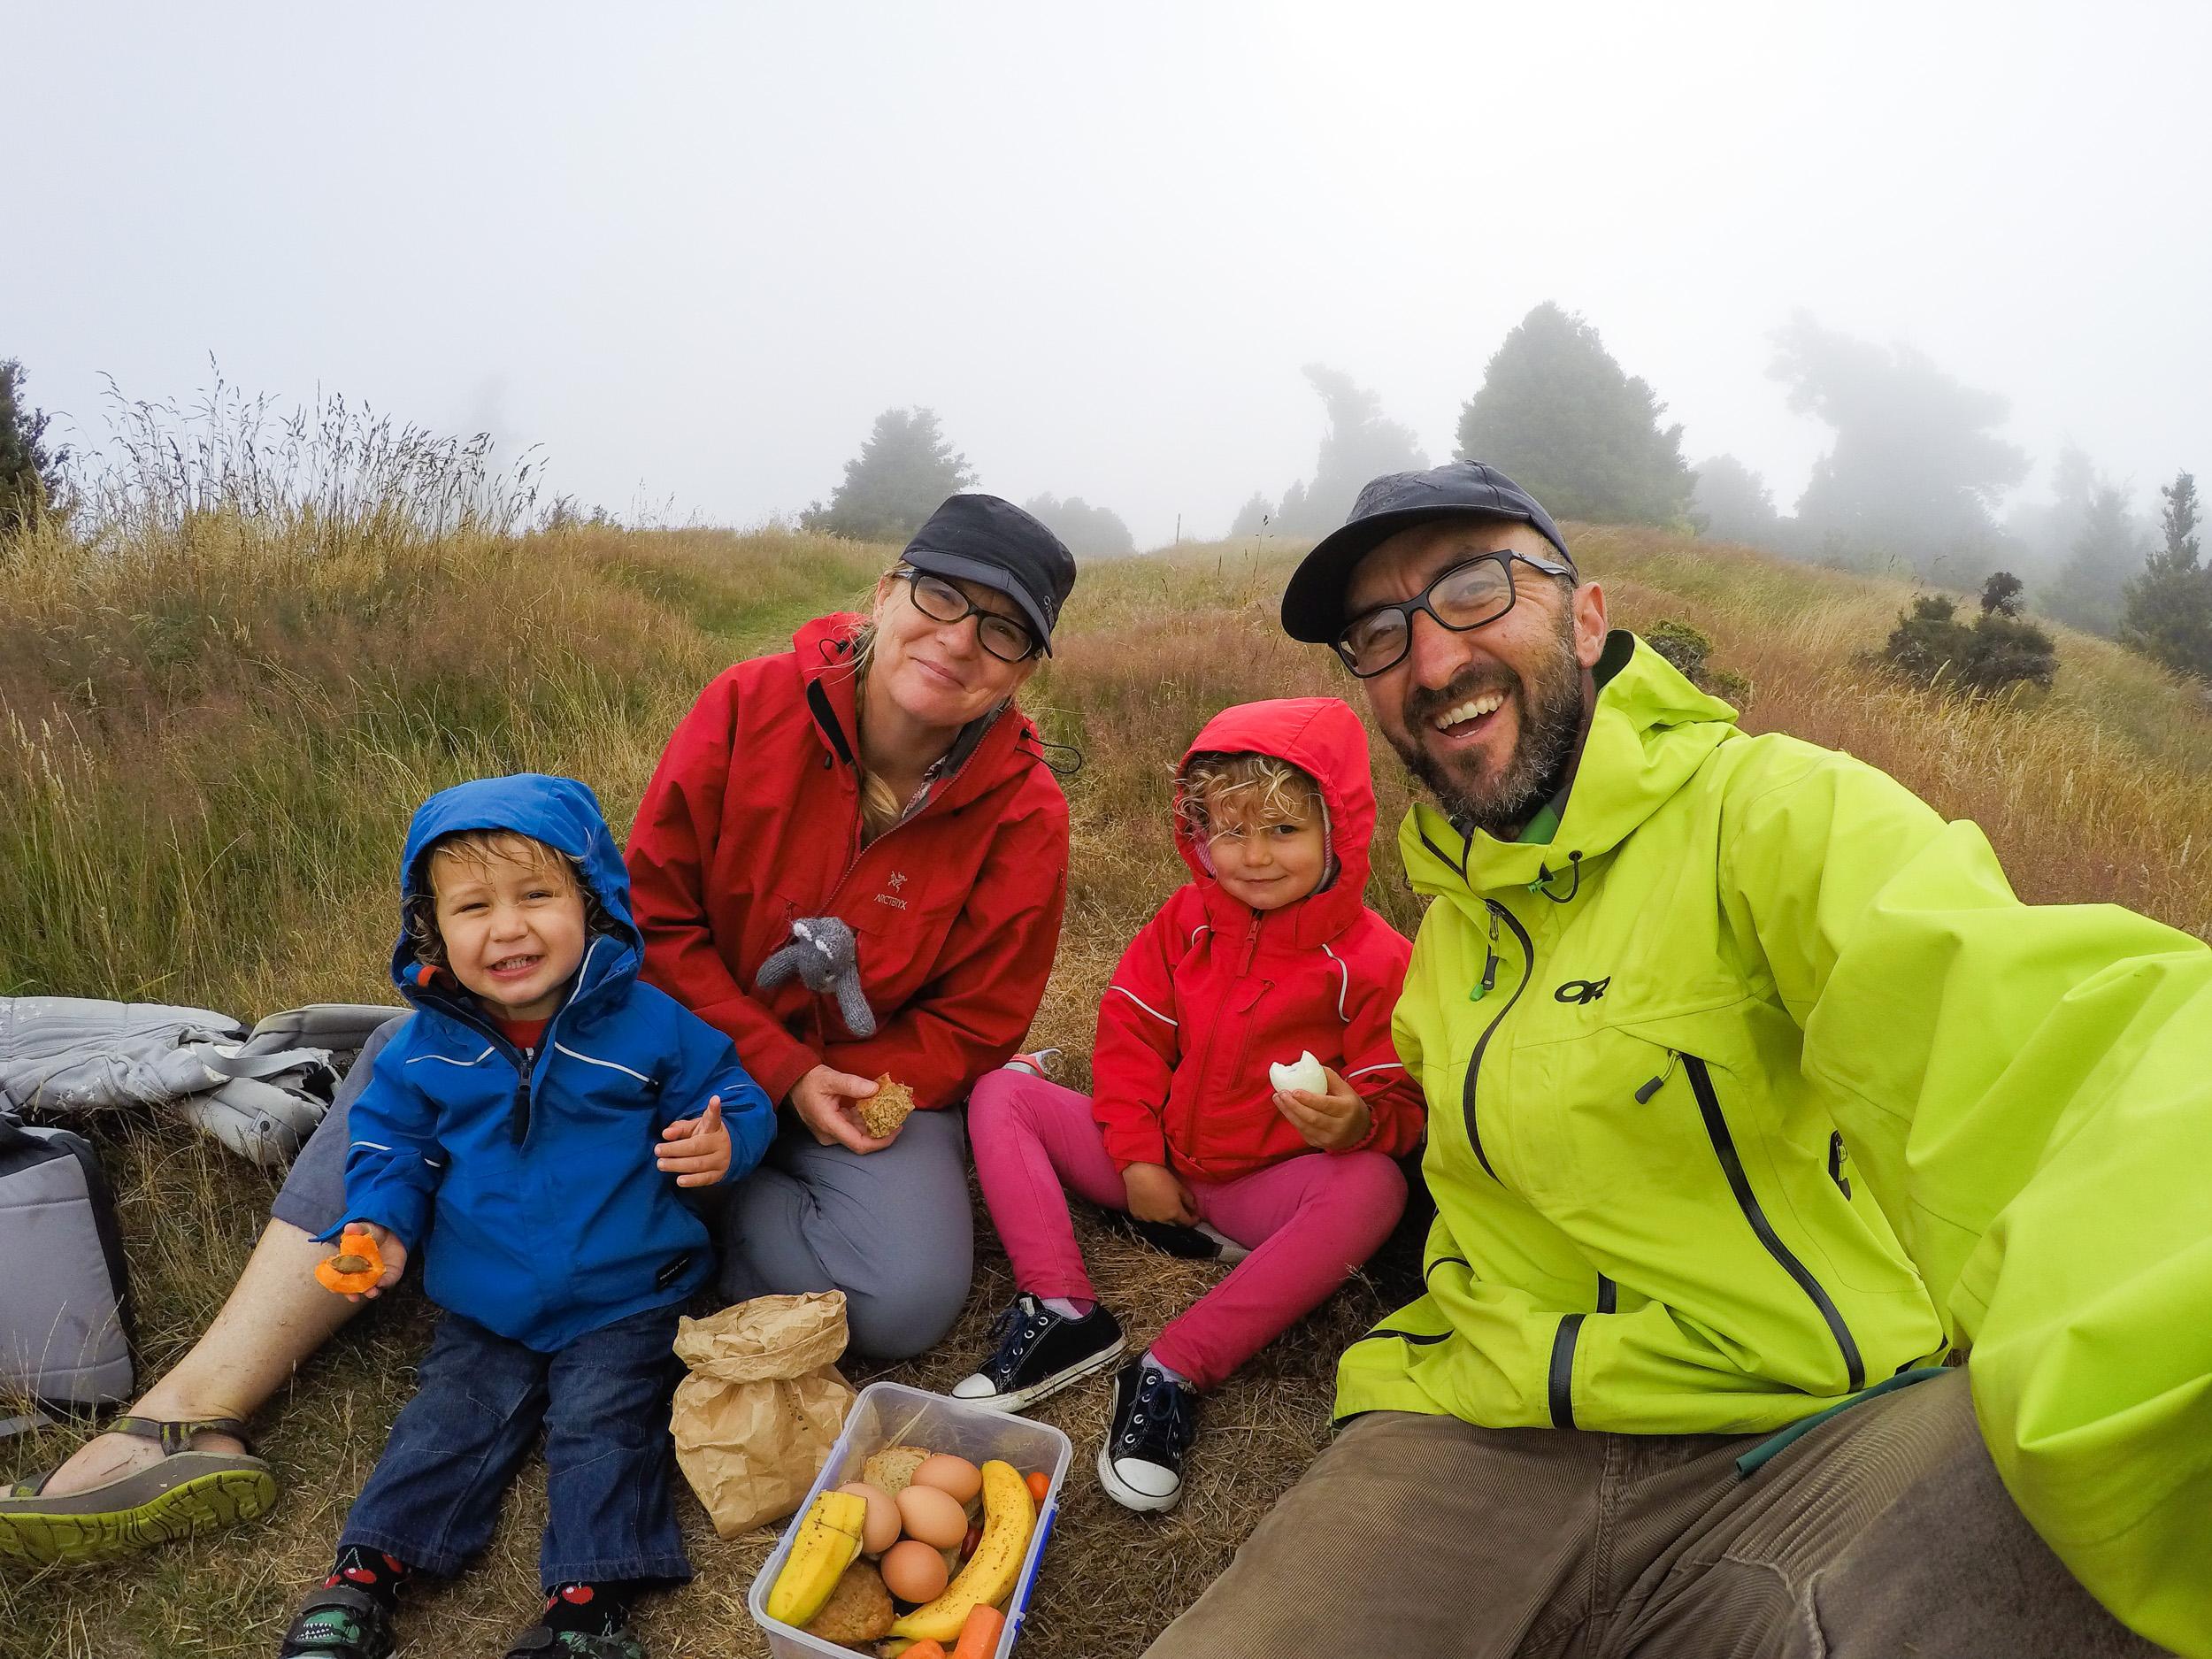 Family selfie, Banks Peninsula, South Island, New Zealand.